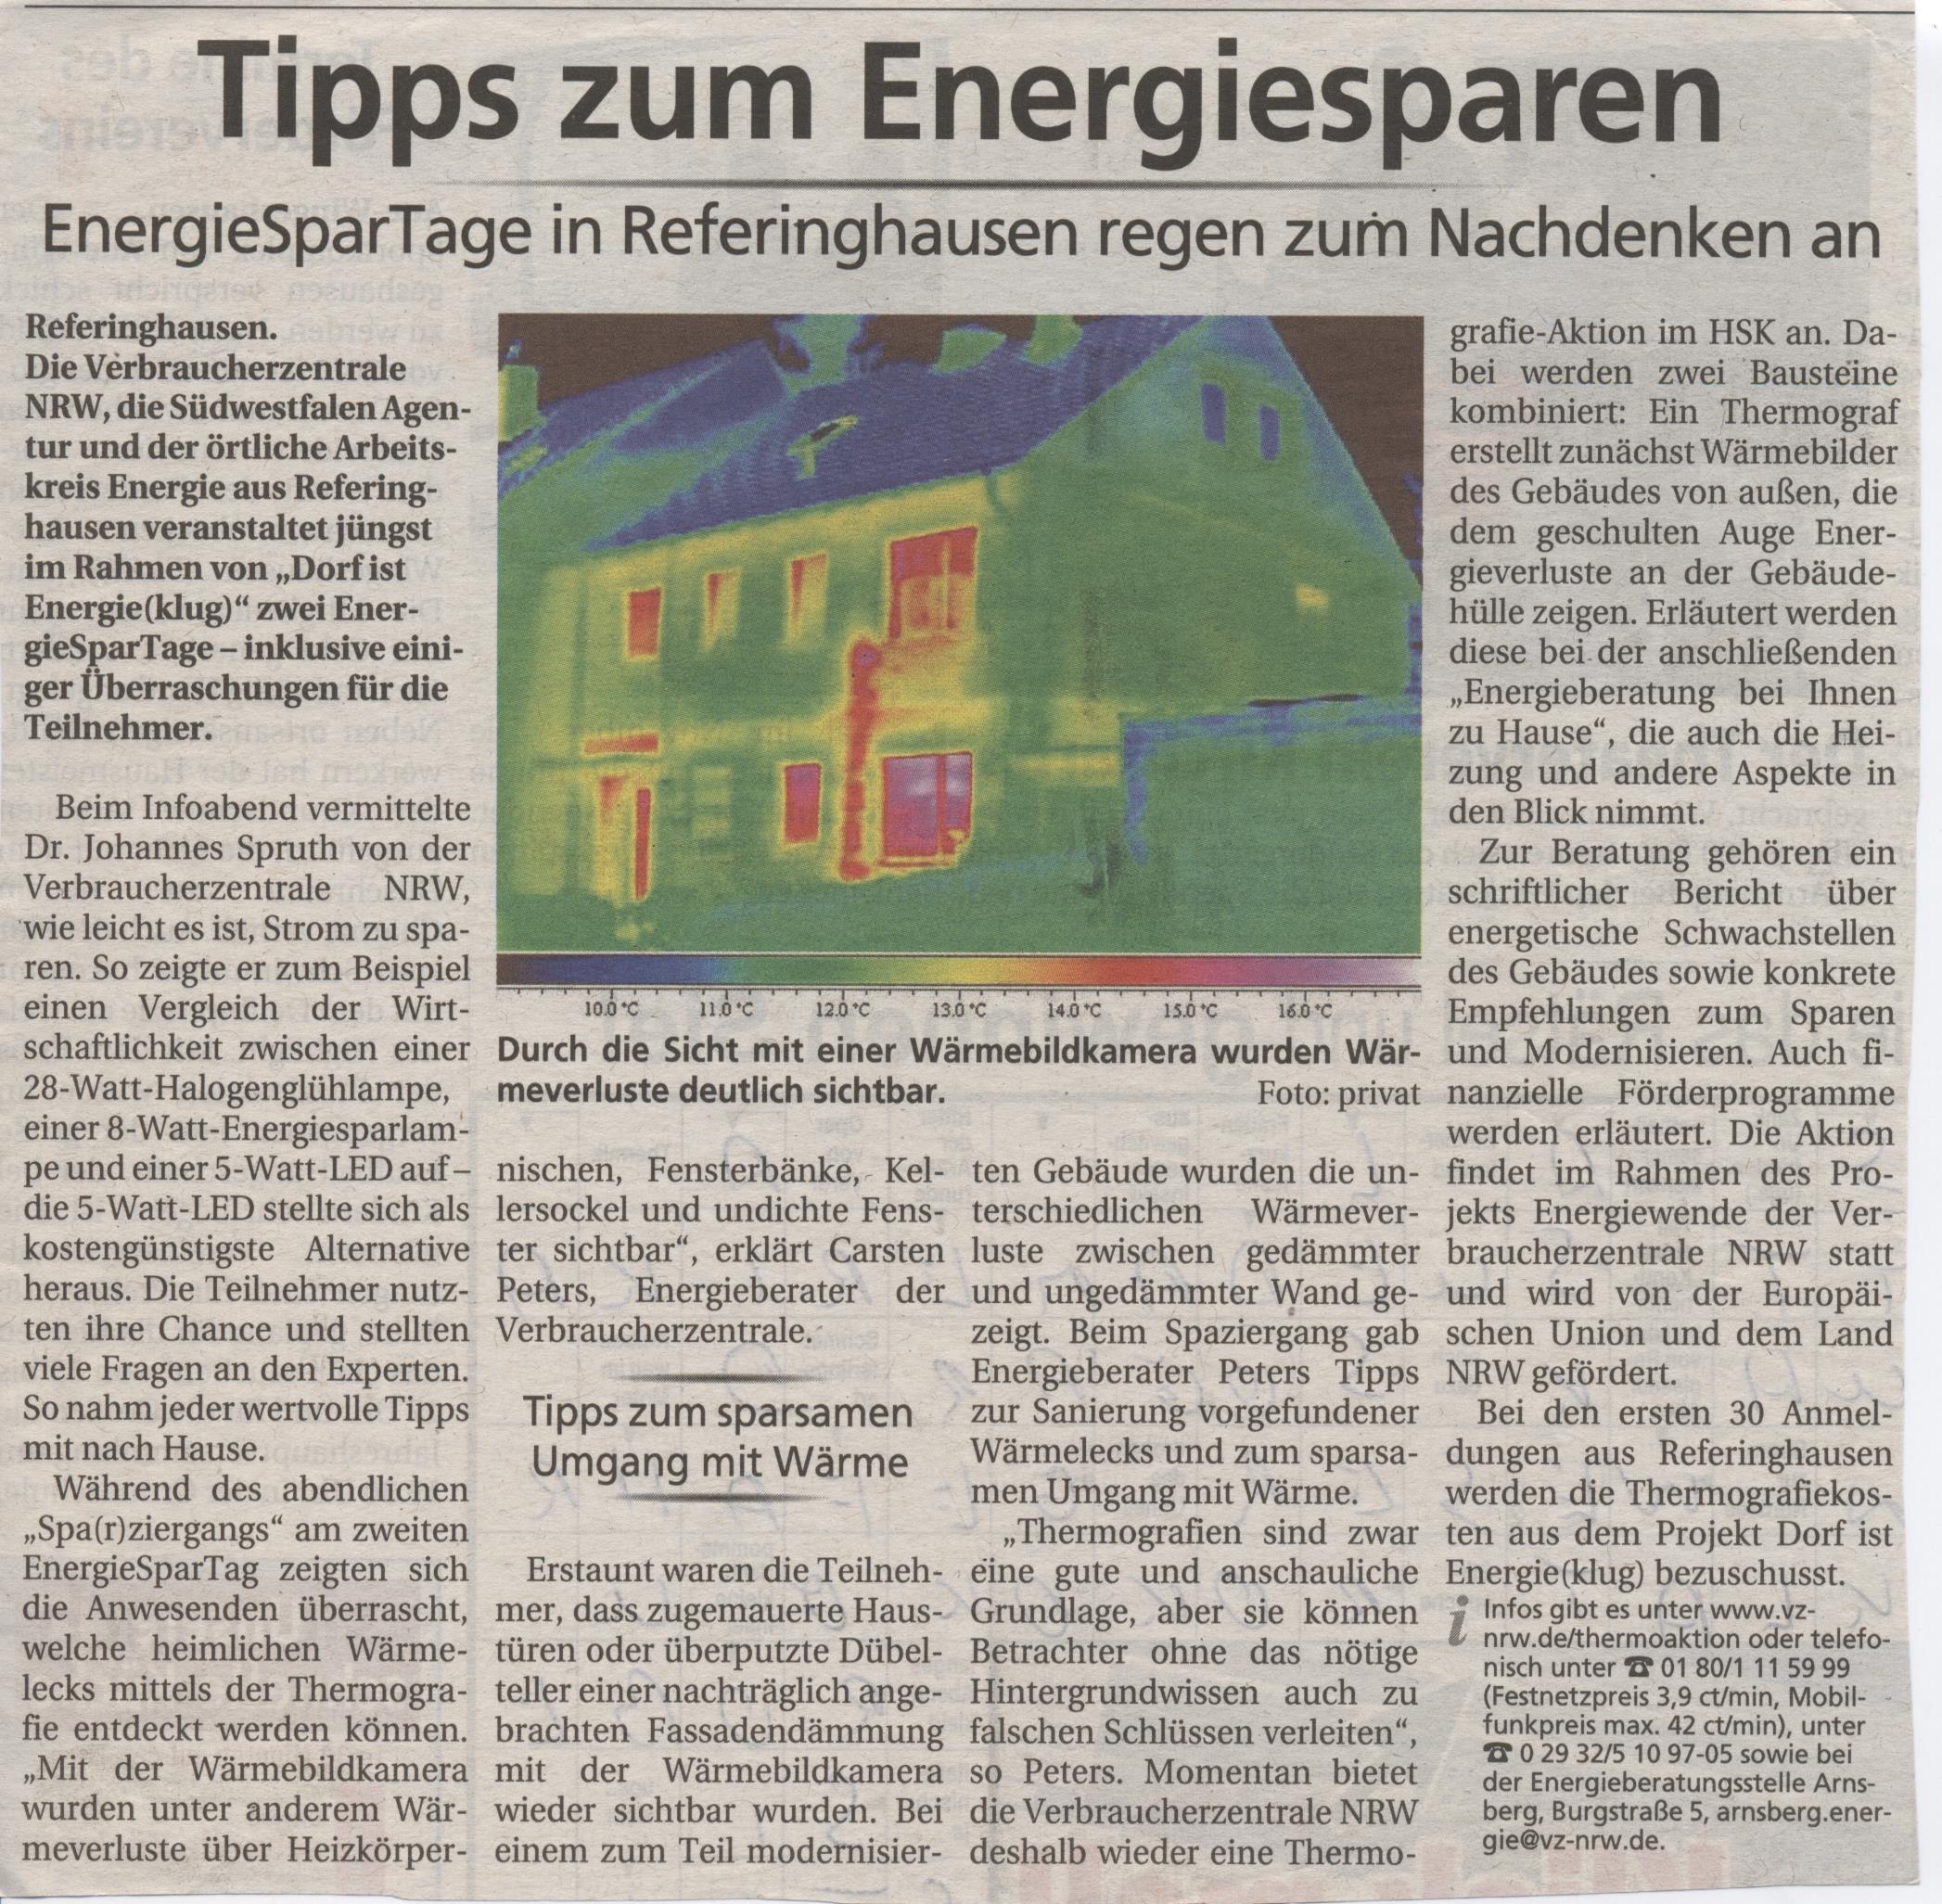 Tipps zum Energiesparen